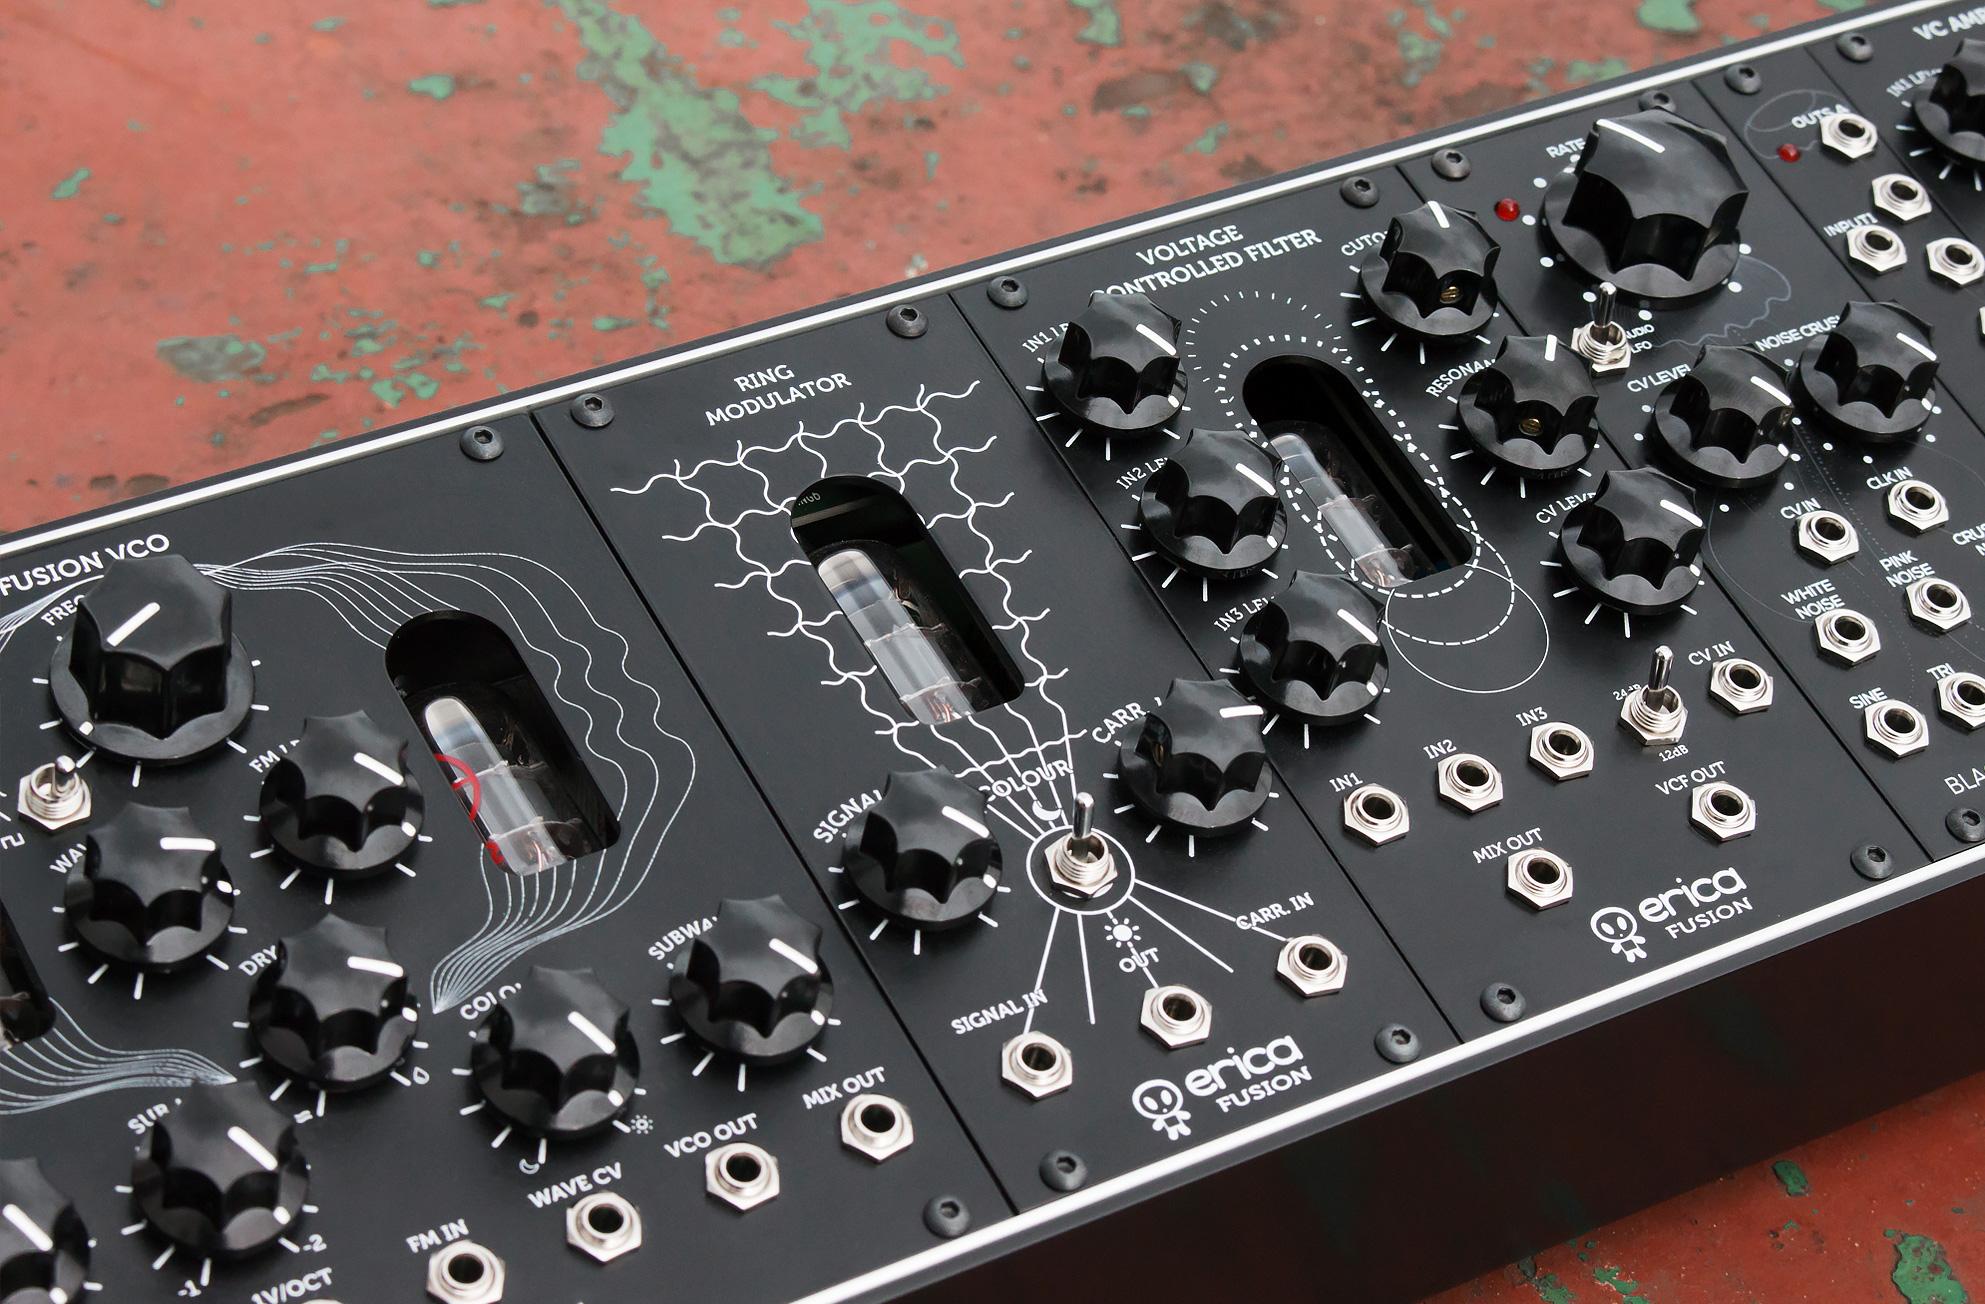 syst u00e8me modulaire analogique  u00e0 lampes au format eurorack